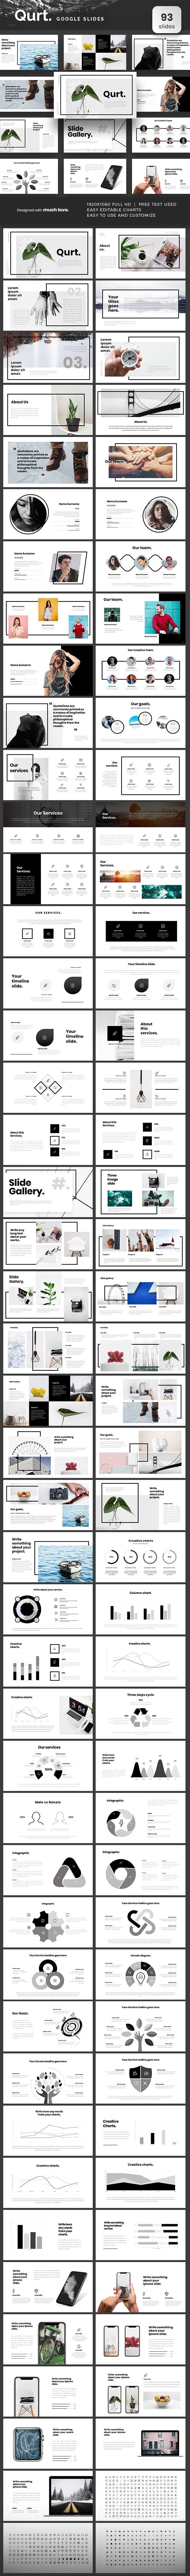 Qurt Google Slides - Google Slides Presentation Templates